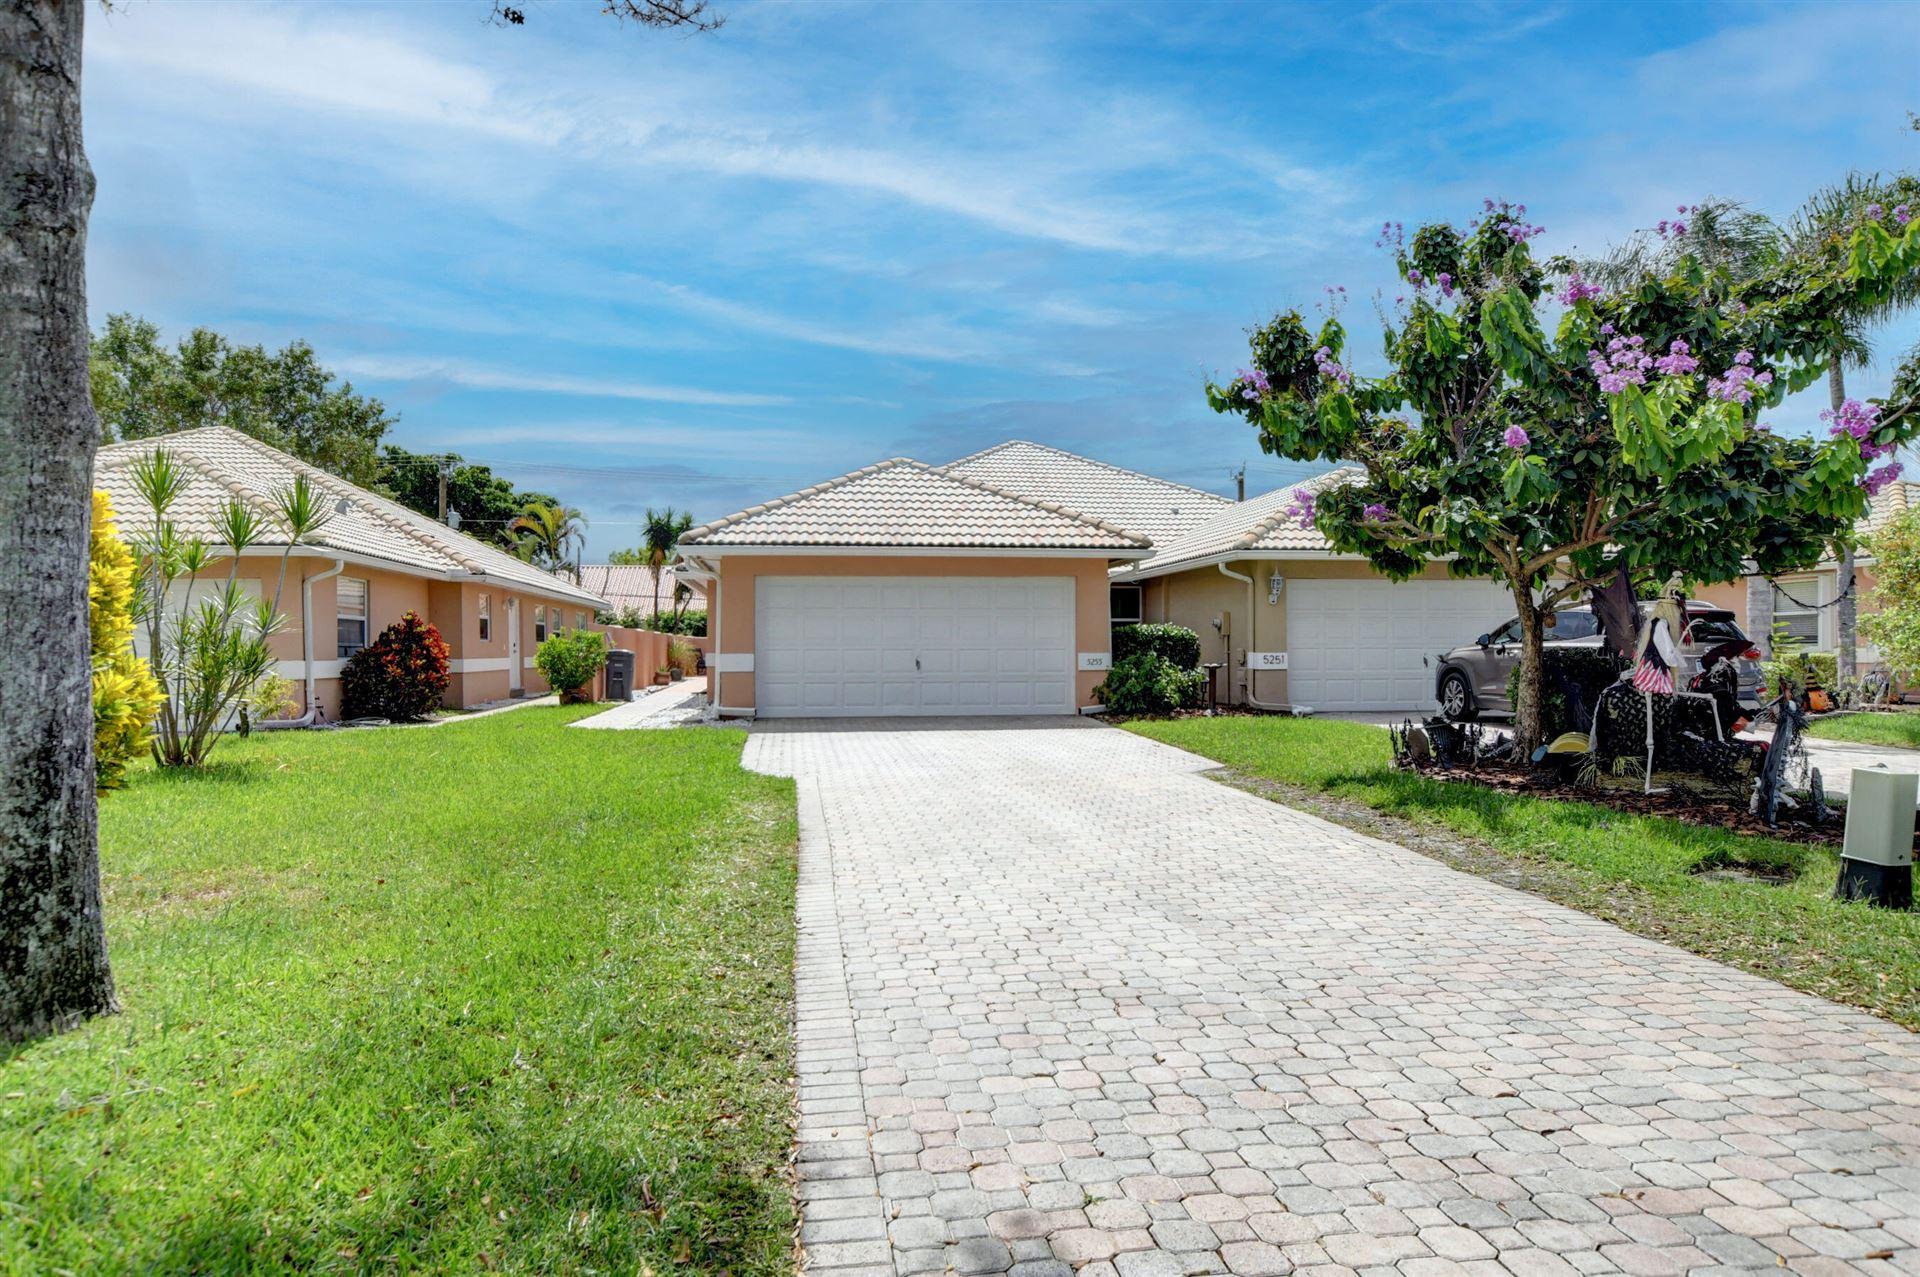 5255 Grande Palm Circle, Delray Beach, FL 33484 - MLS#: RX-10750172